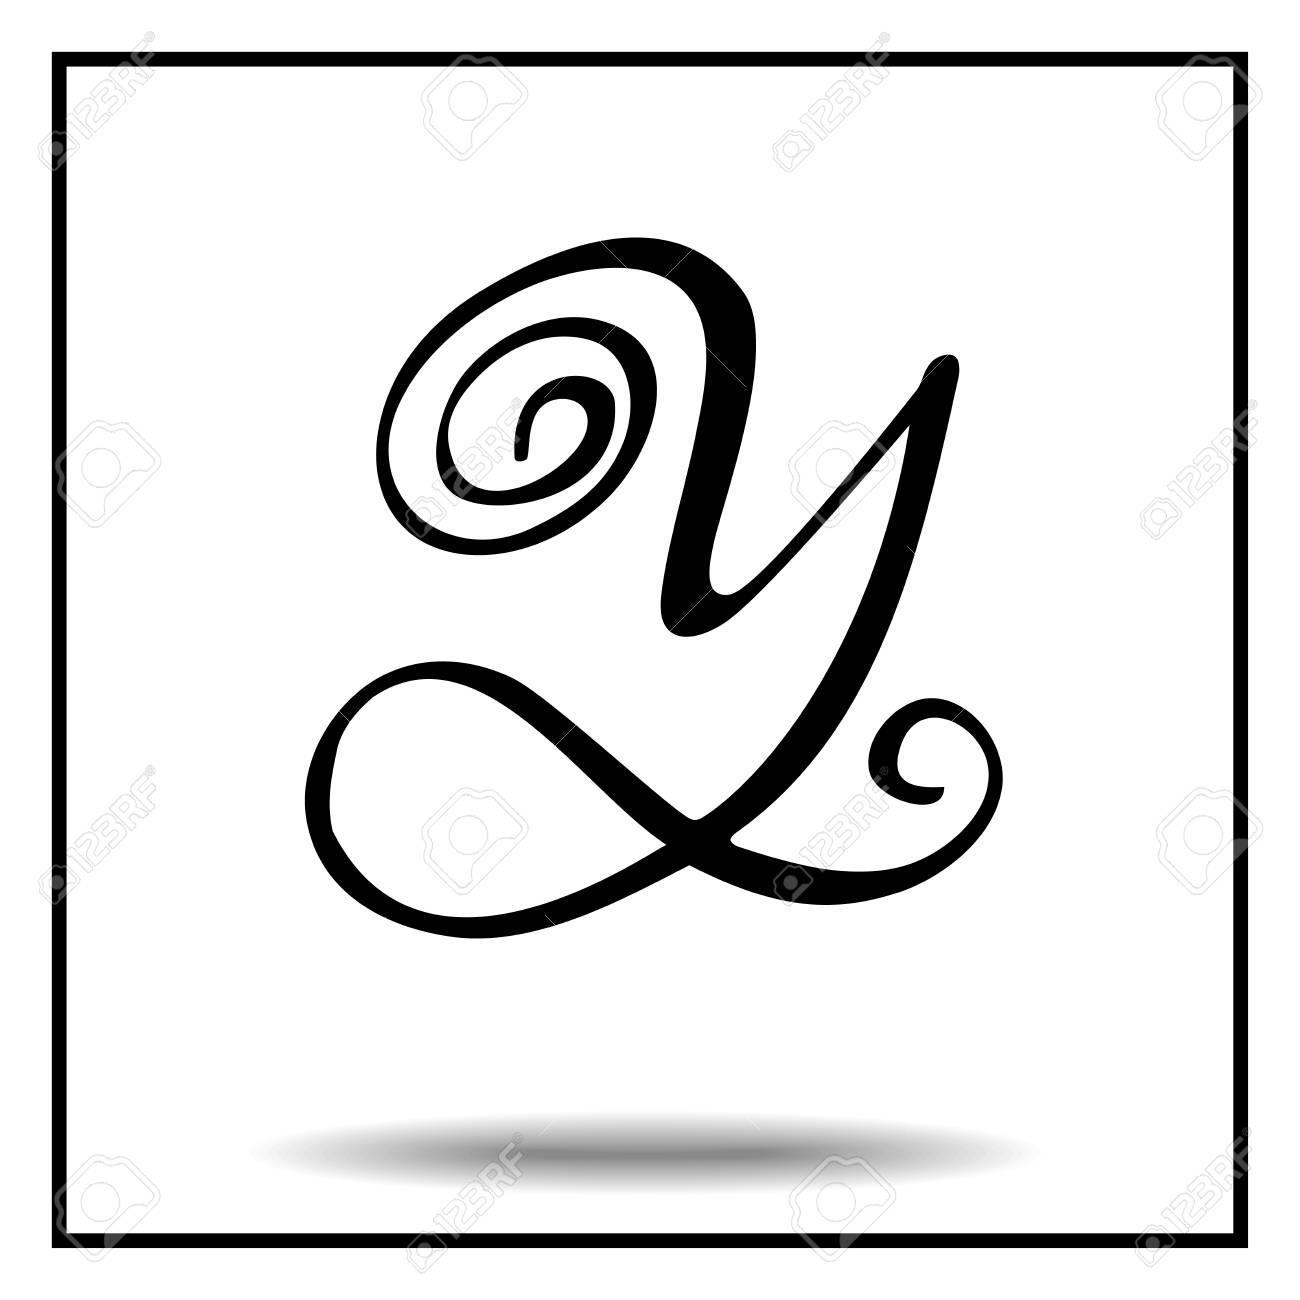 Elegant Handmade Font Black And White Vintage Letter Y Royalty Free